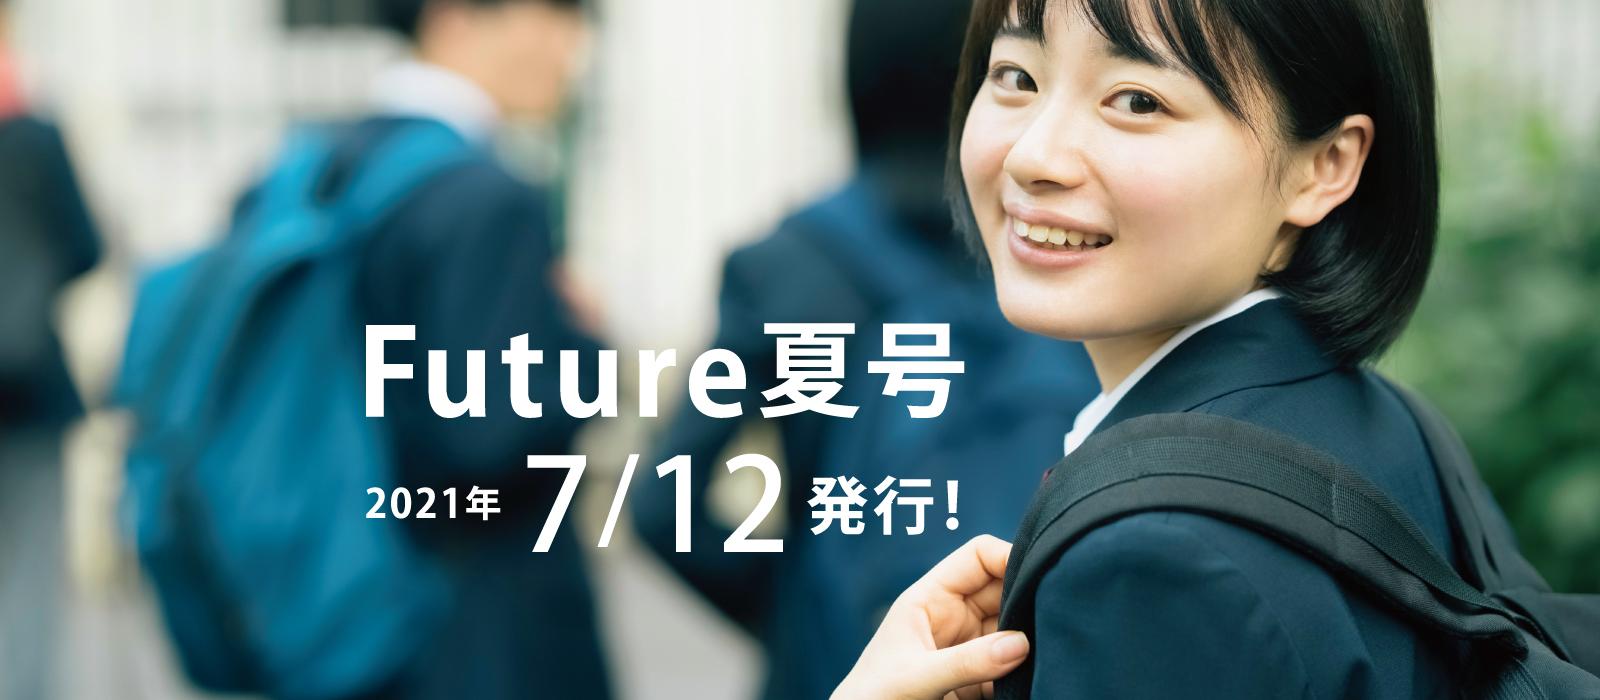 Future 夏号 7月12日発行!